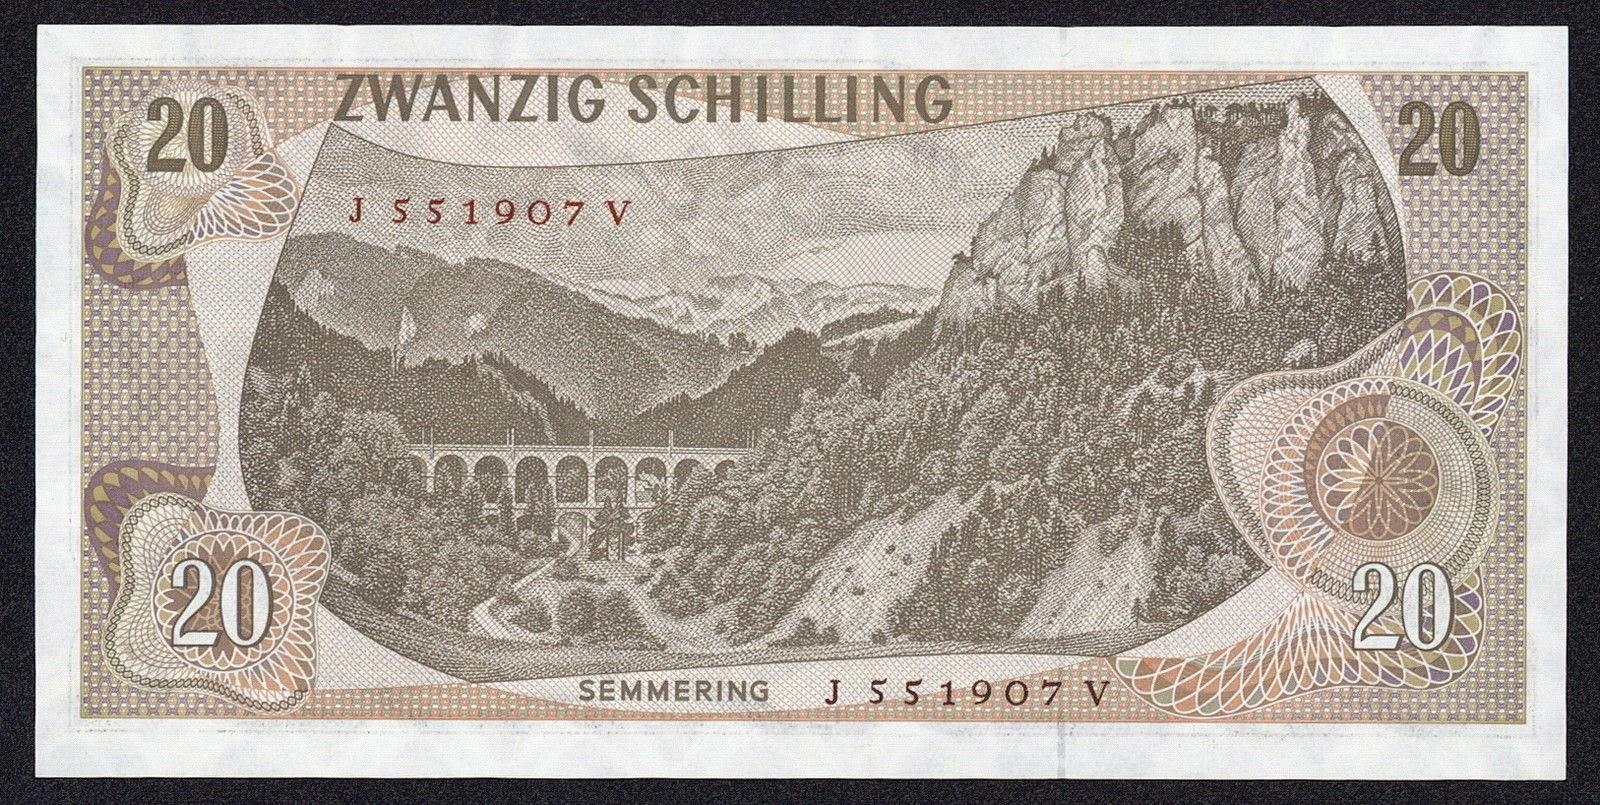 Austria Money Currency 20 Schilling banknote 1967 Semmering railway